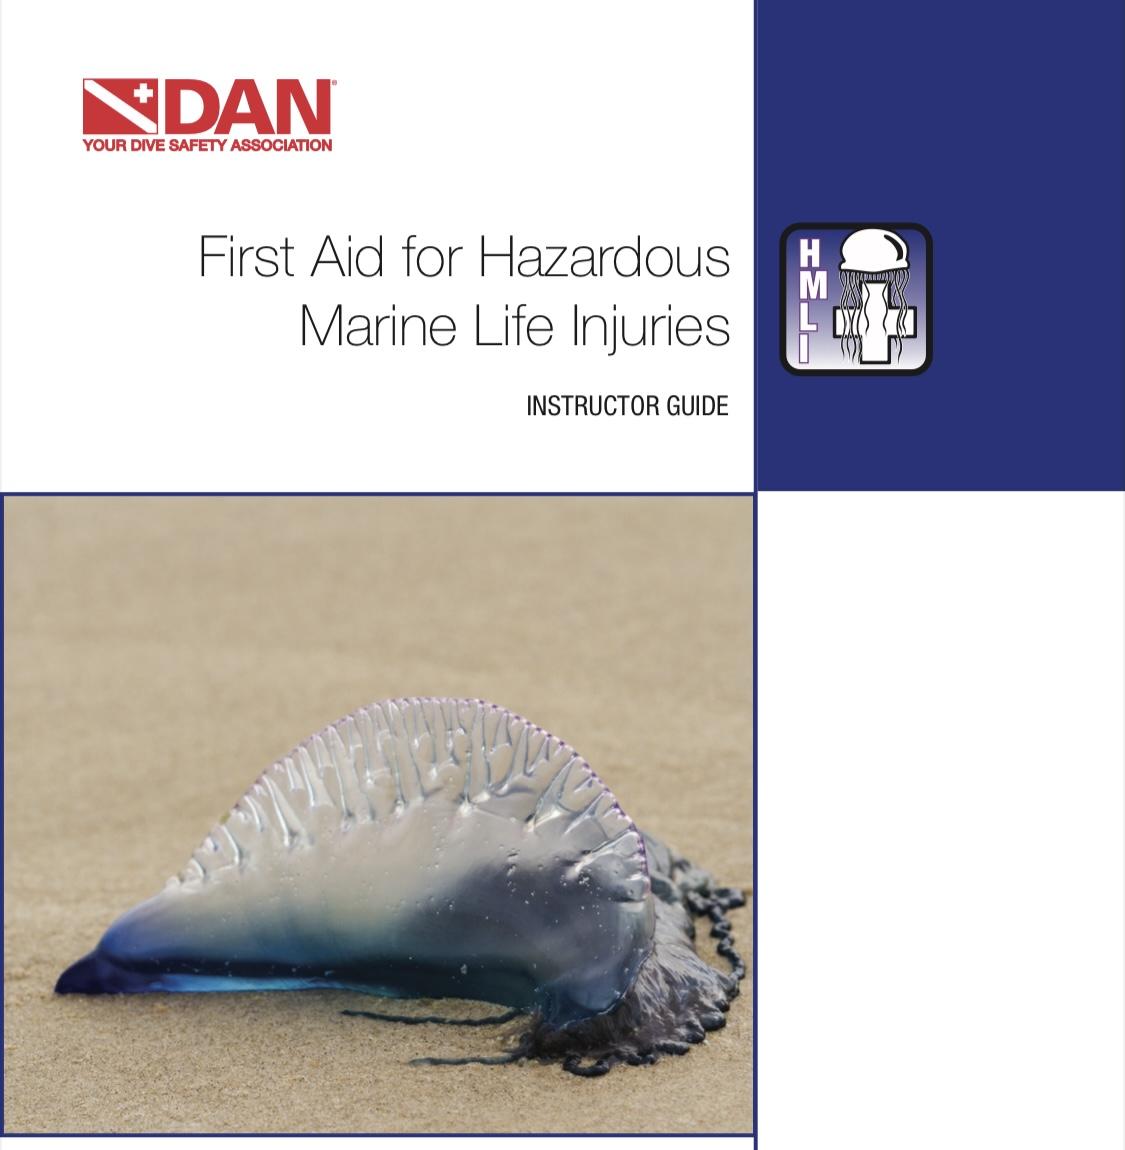 DAN Hazardous Marine Life Injuries course